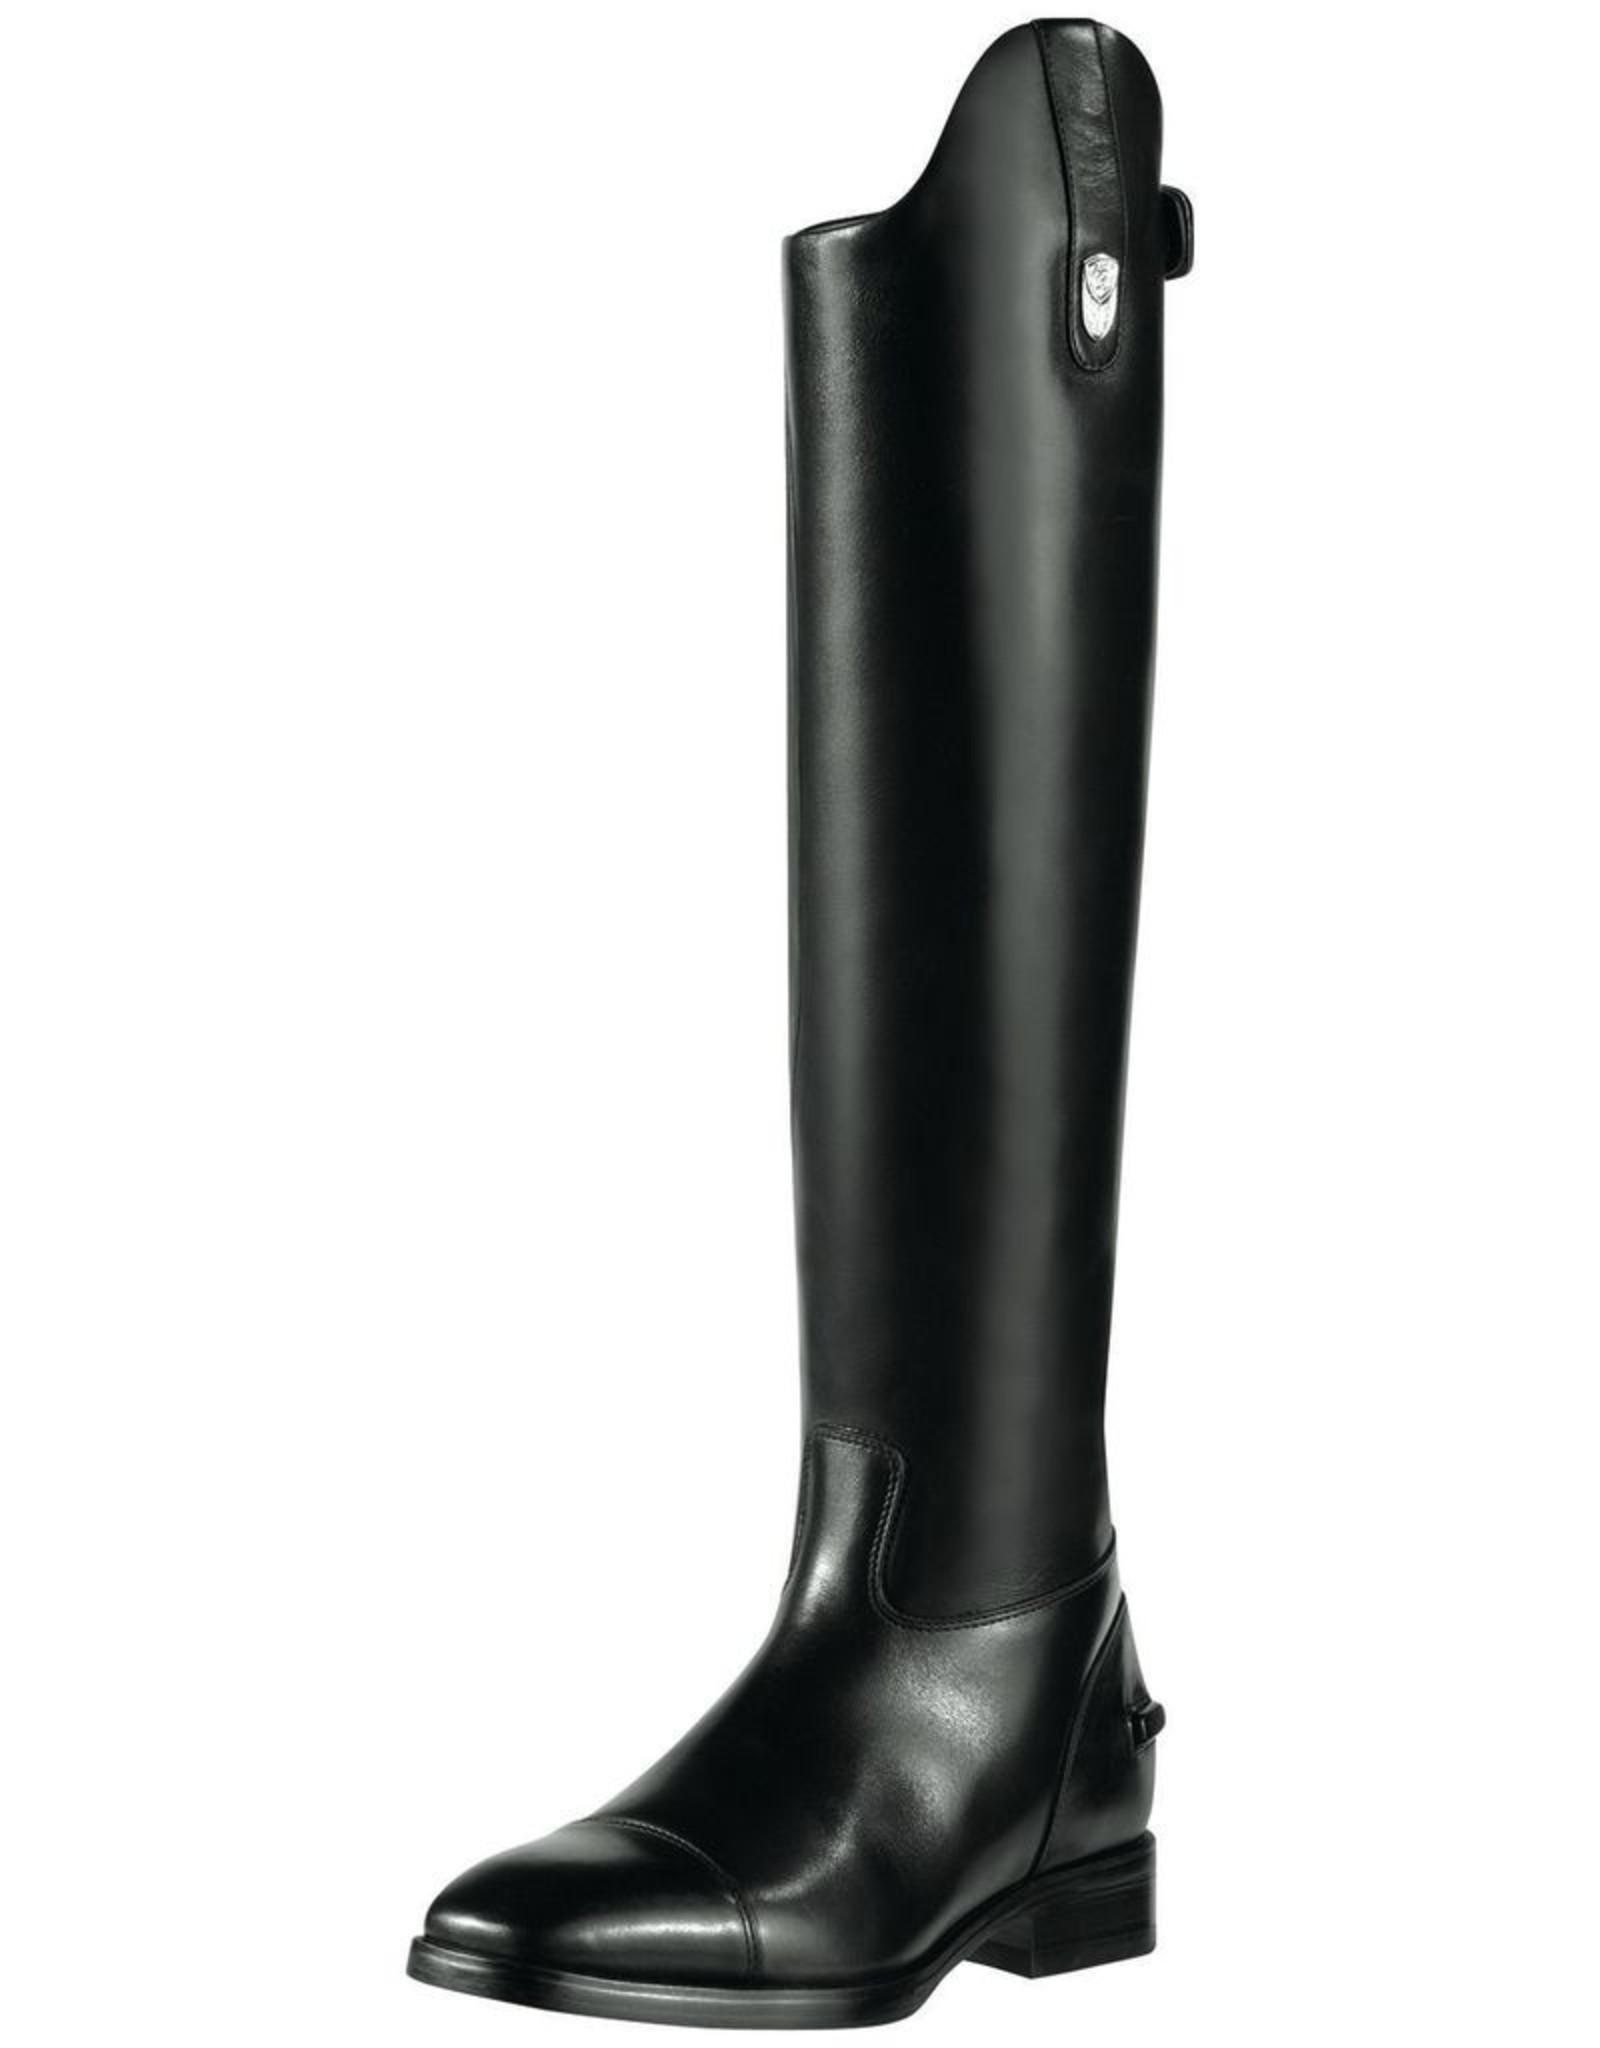 Ariat Monaco Dress Tall Boot - 6 Wide/Medium